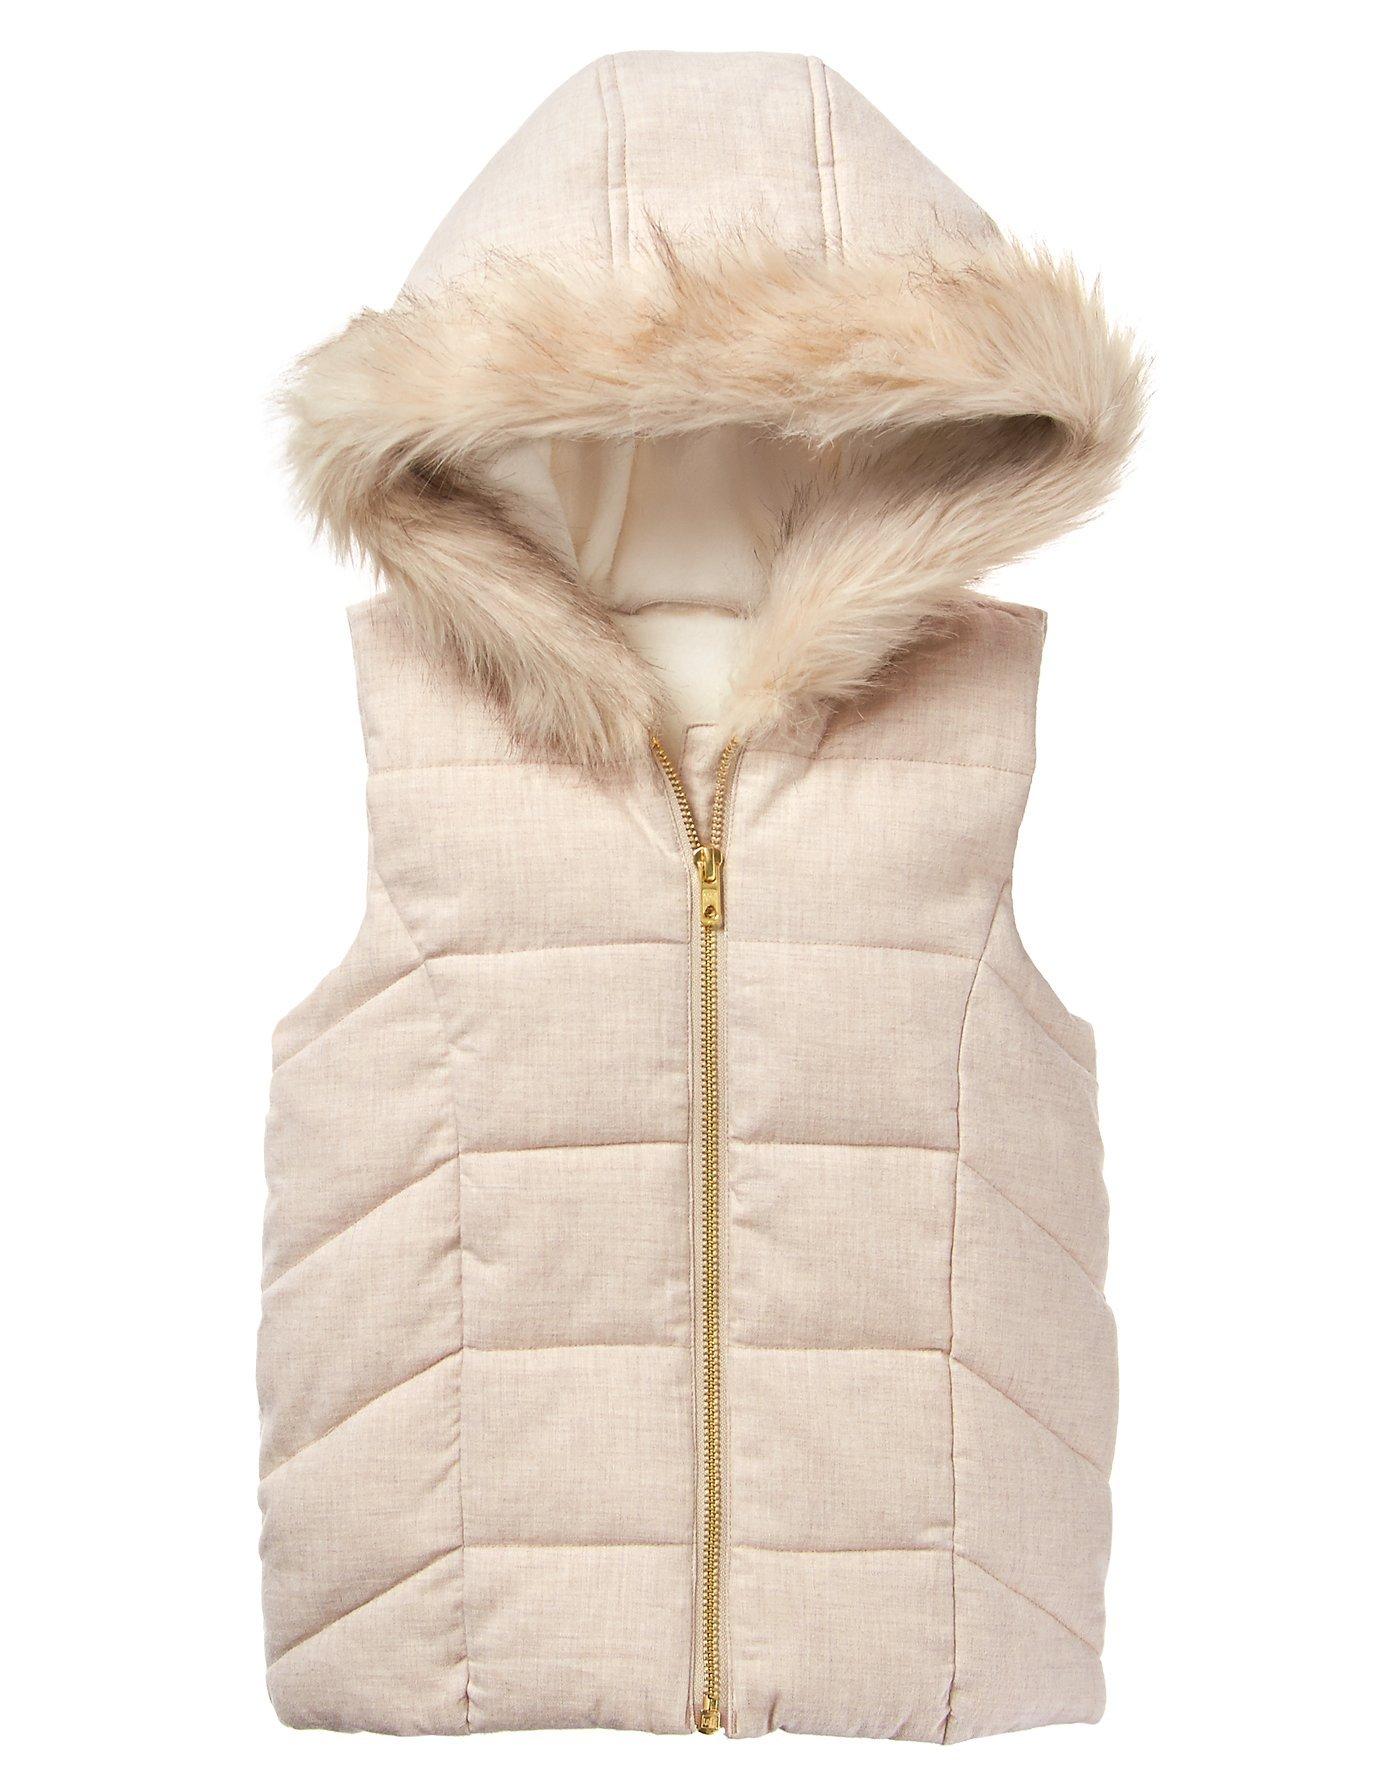 Crazy 8 Little Girls' Faux Fur Puffer Vest, Oatmeal, M